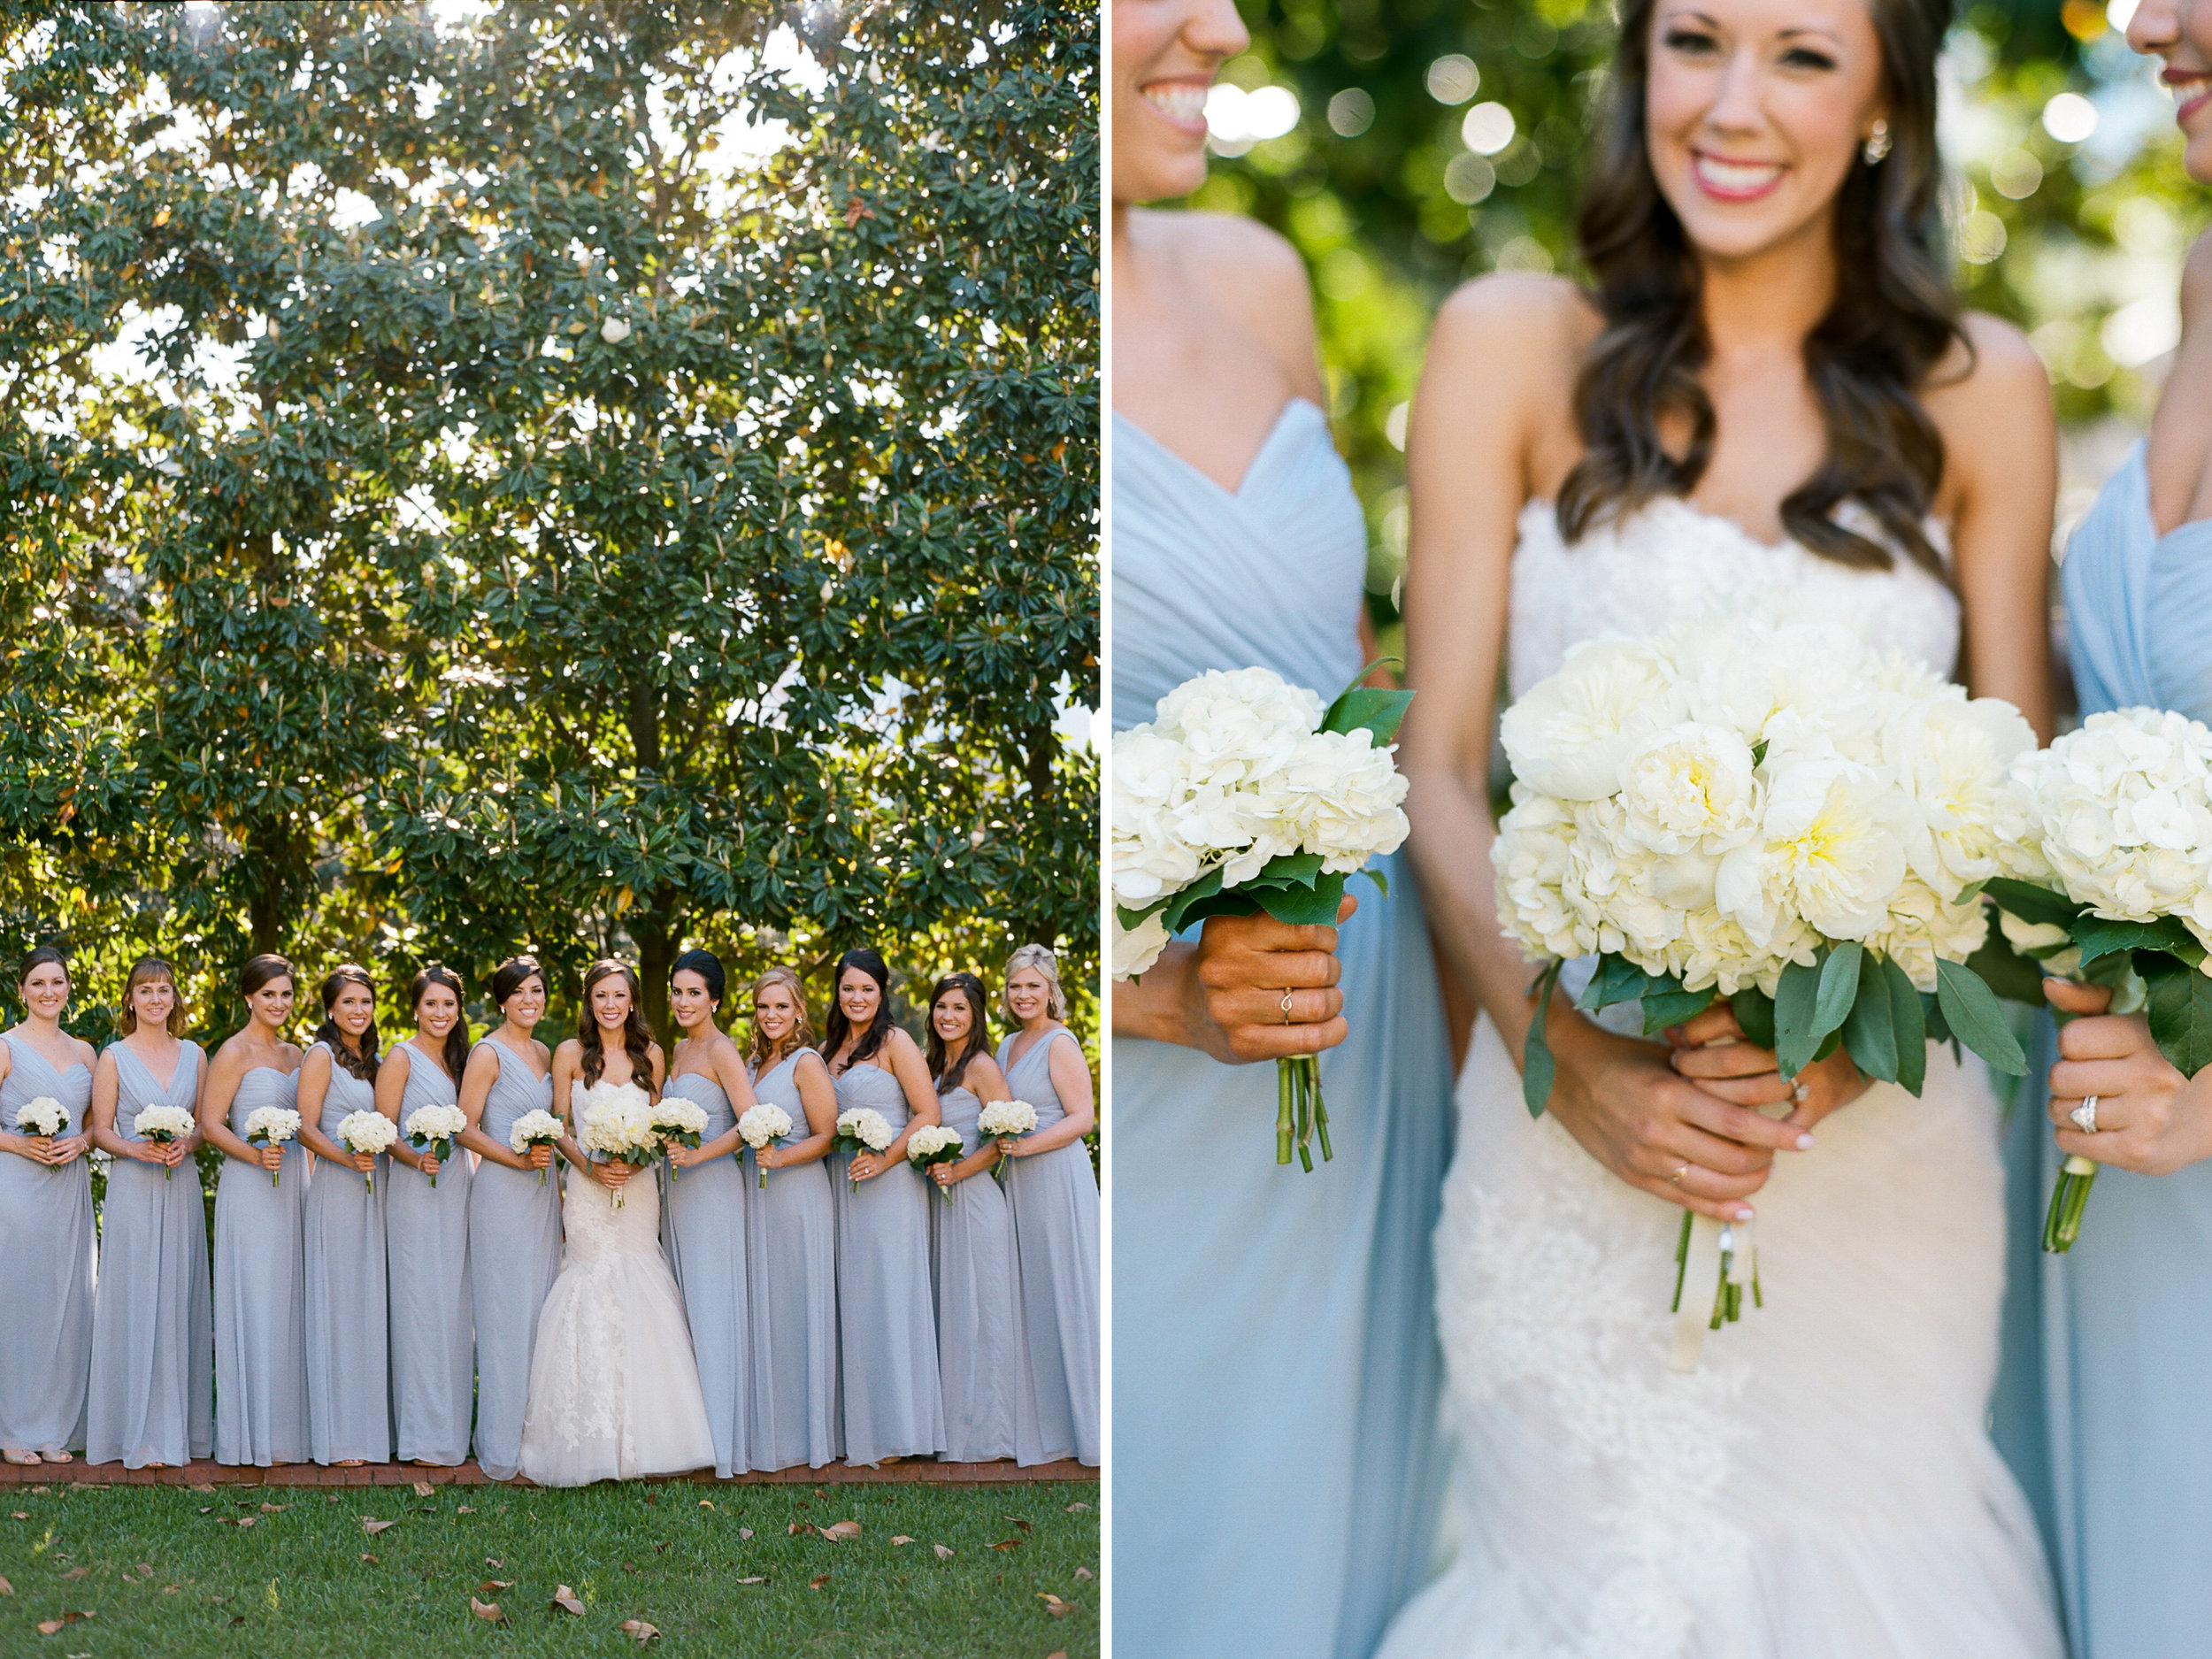 St.-Philip-Presbyterian-Church-Houston-Wedding-Ceremony-The-Junior-League-Of-Houston-Reception-Dana-Fernandez-Photography-Fine-Art-Film-111.jpg